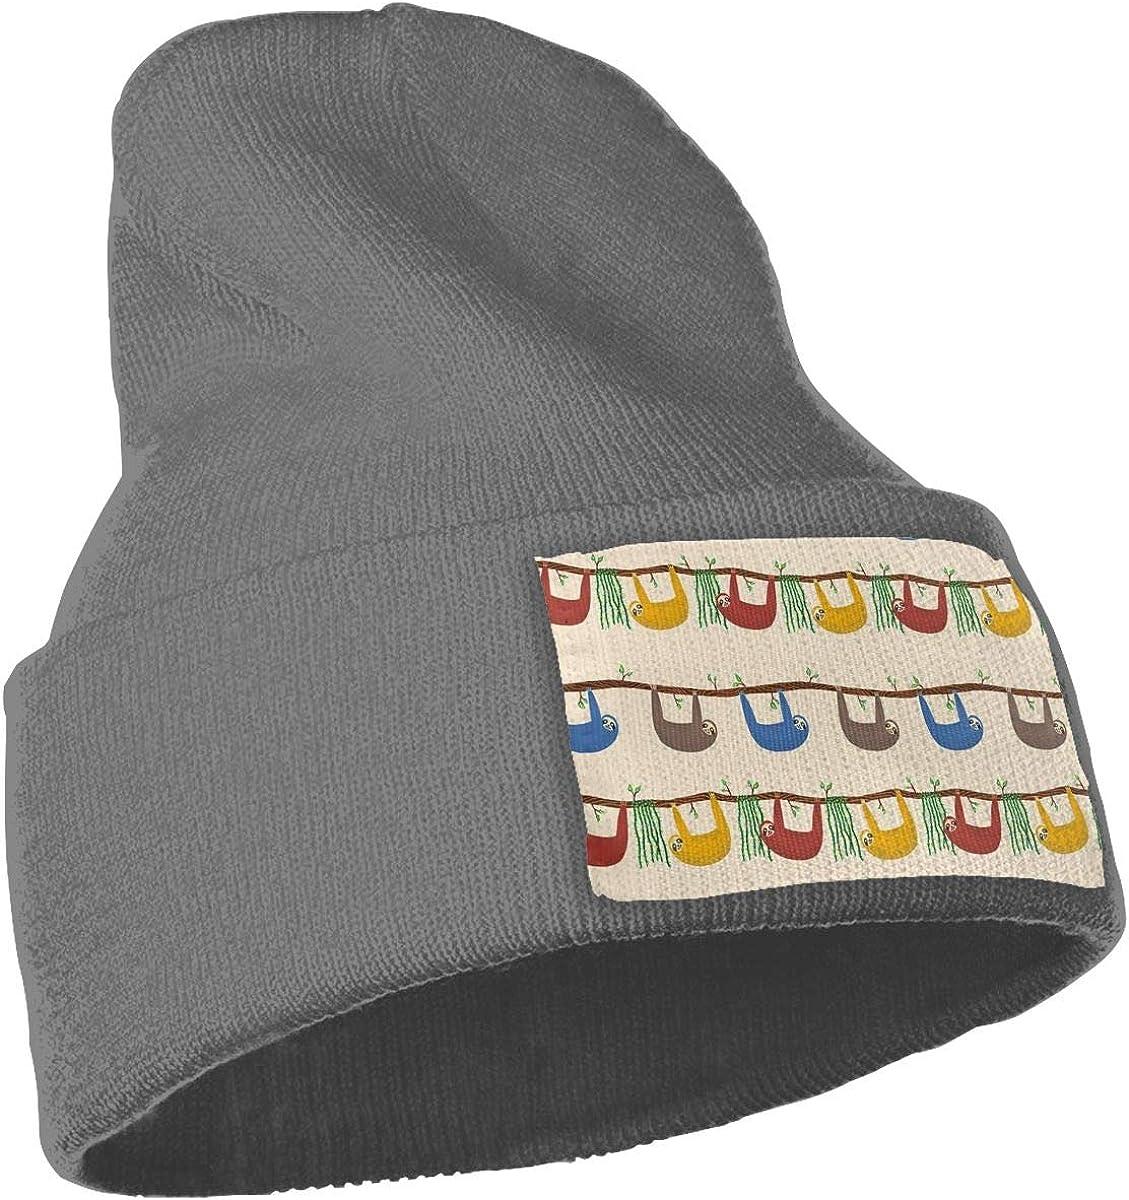 Sloths Soft Ski Cap Ydbve81-G Mens Womens 100/% Acrylic Knitted Hat Cap